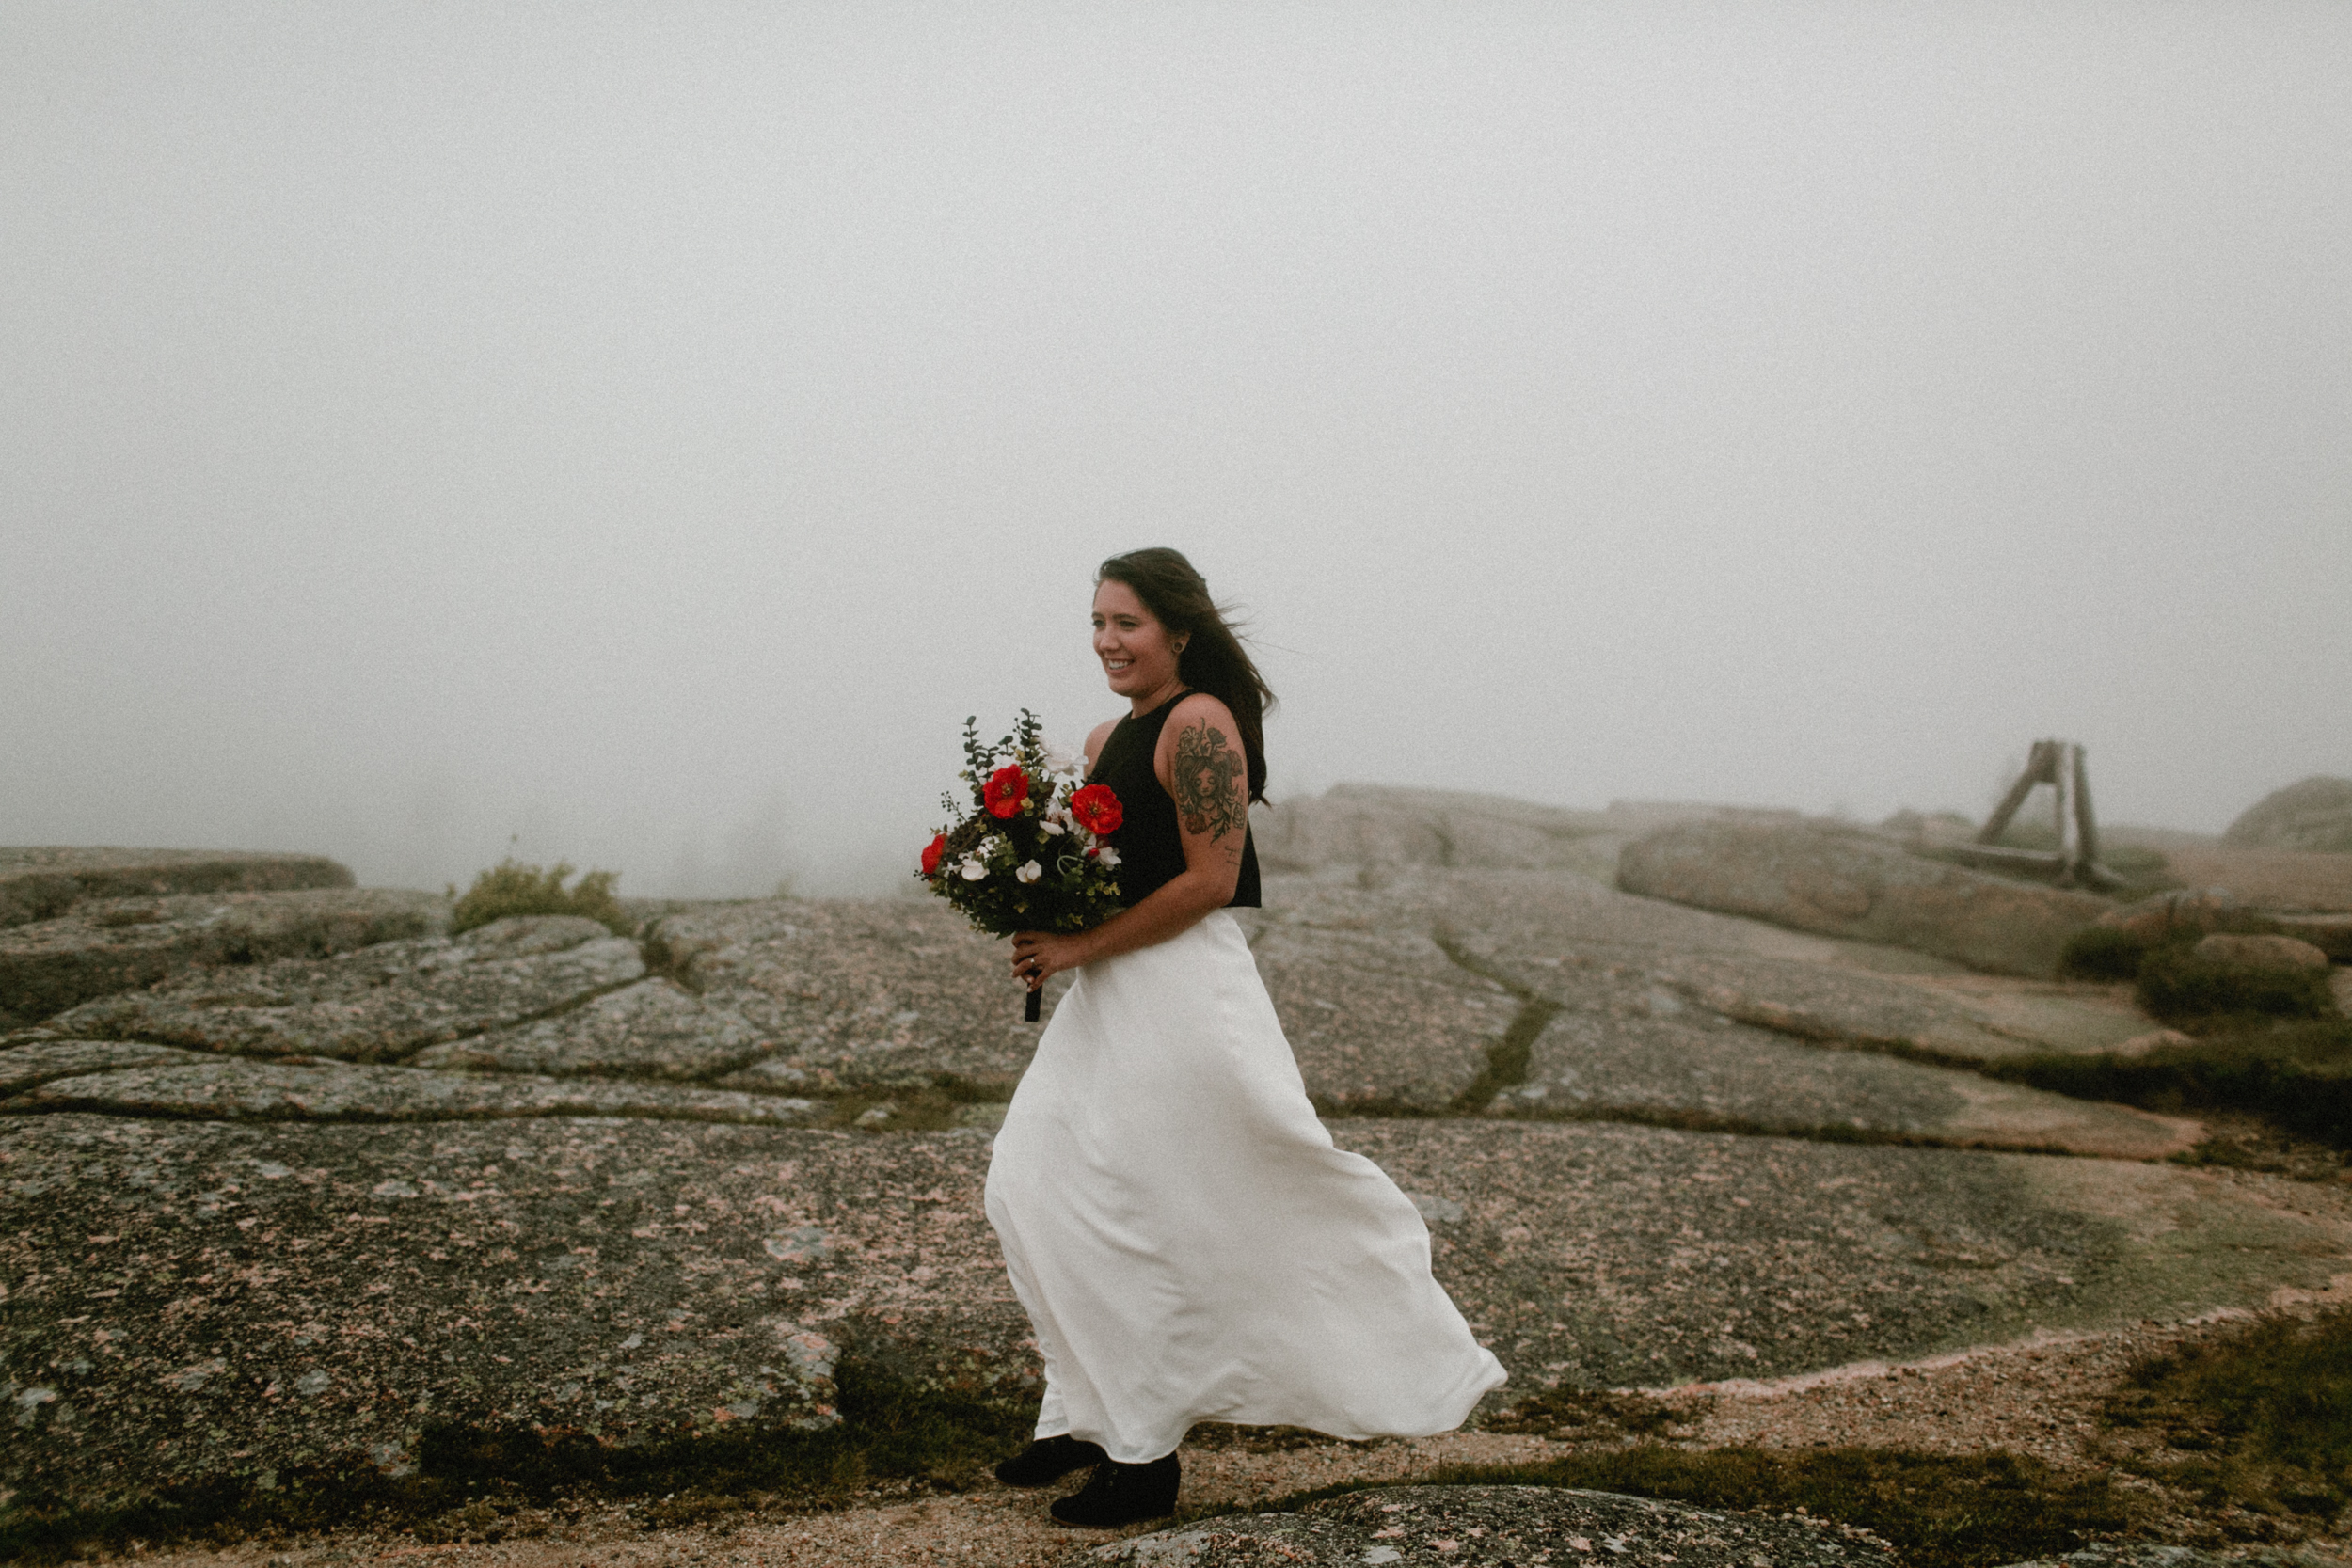 Acadia-National-Park-Elopement-14.jpg